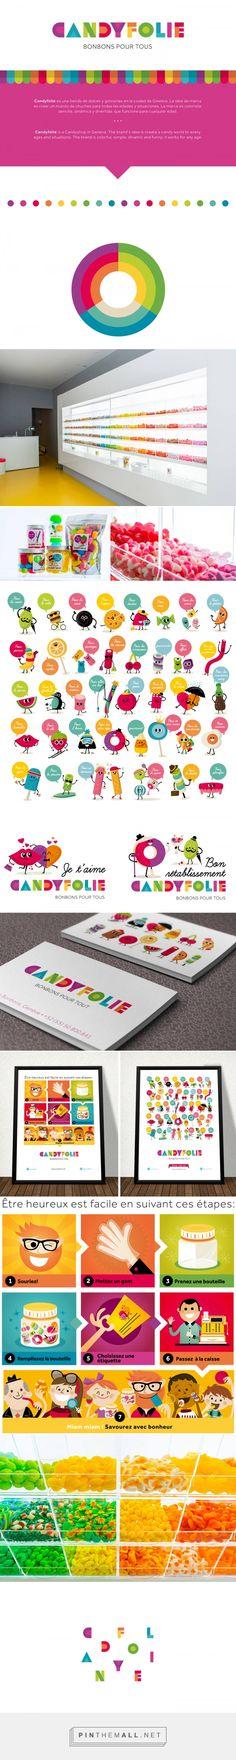 Candyfolie Branding on Behance | Fivestar Branding – Design and Branding Agency & Inspiration Gallery